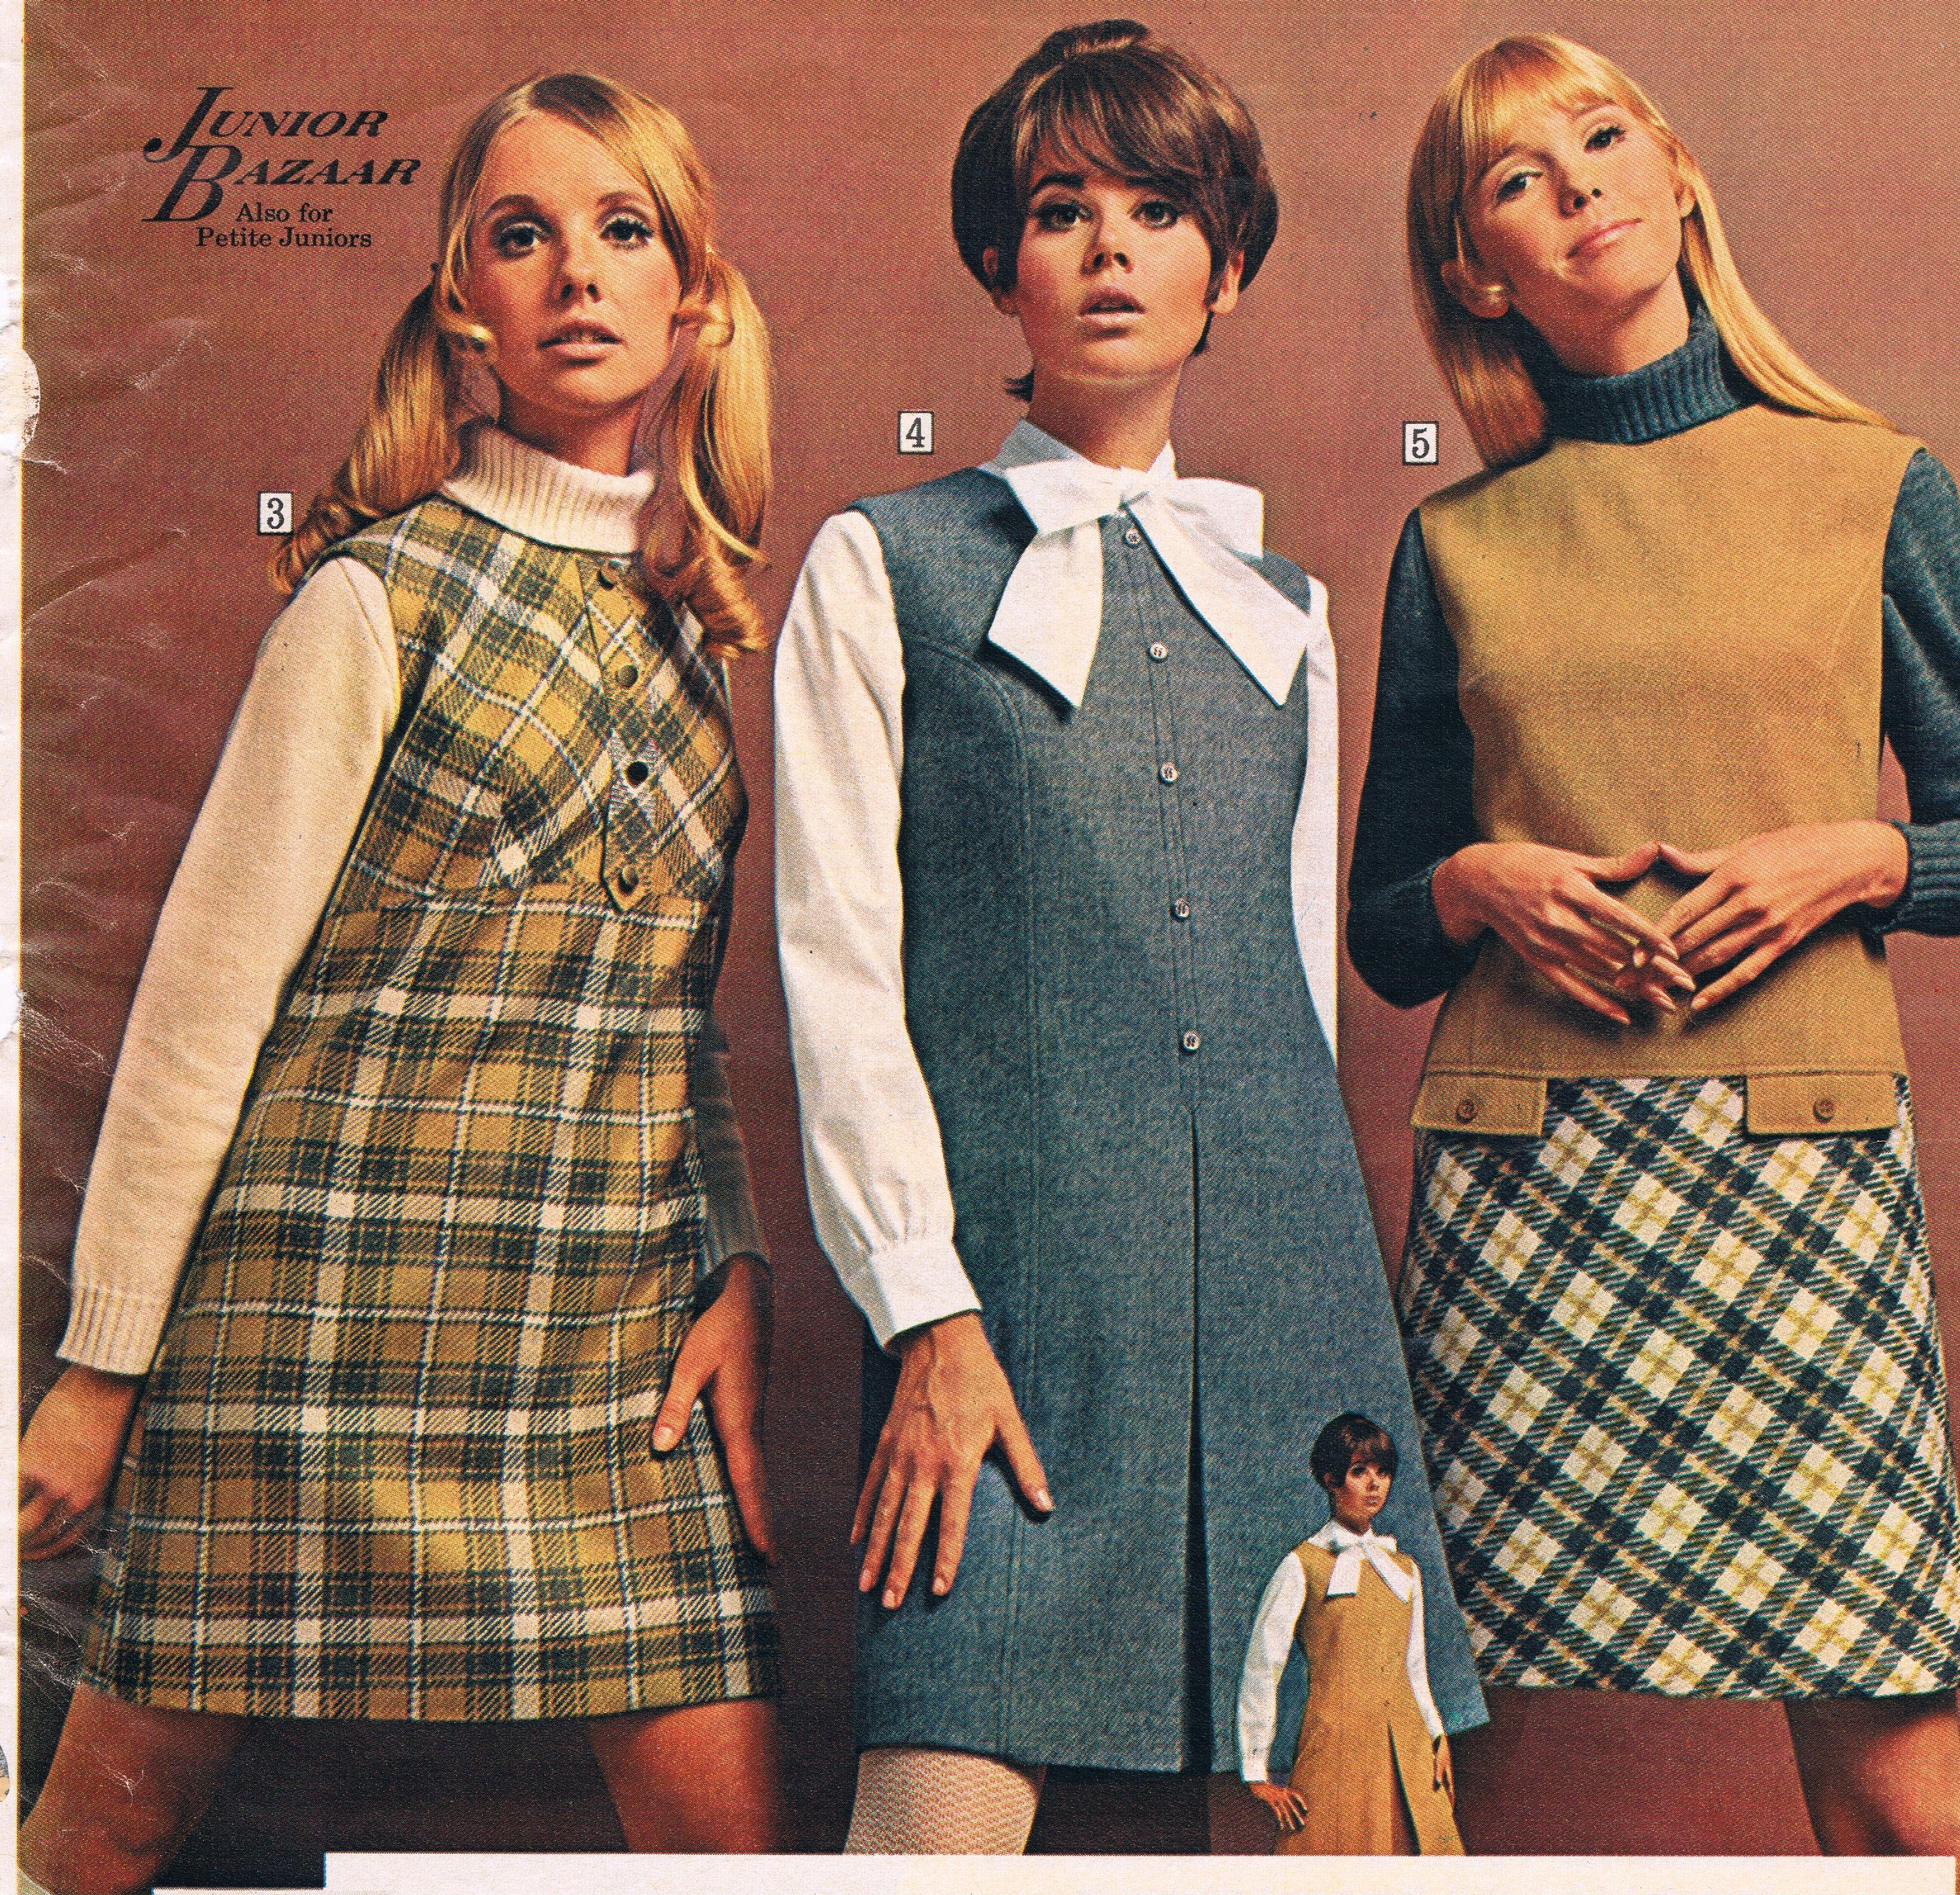 eaeb2d09197 Sears catalog 60s. Cay Sanderson